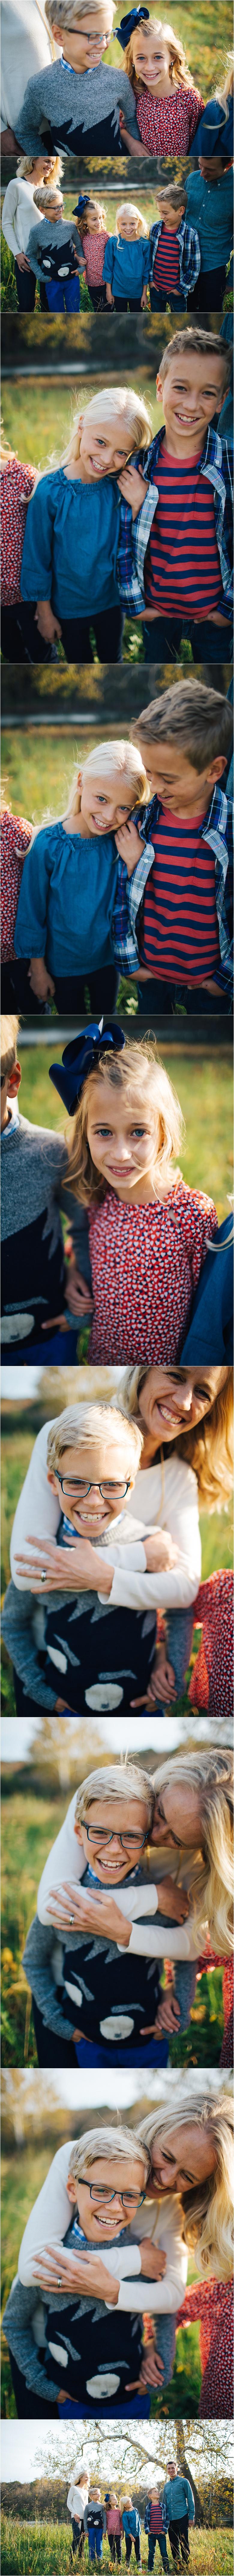 kansascityfamilyphotographer_2010